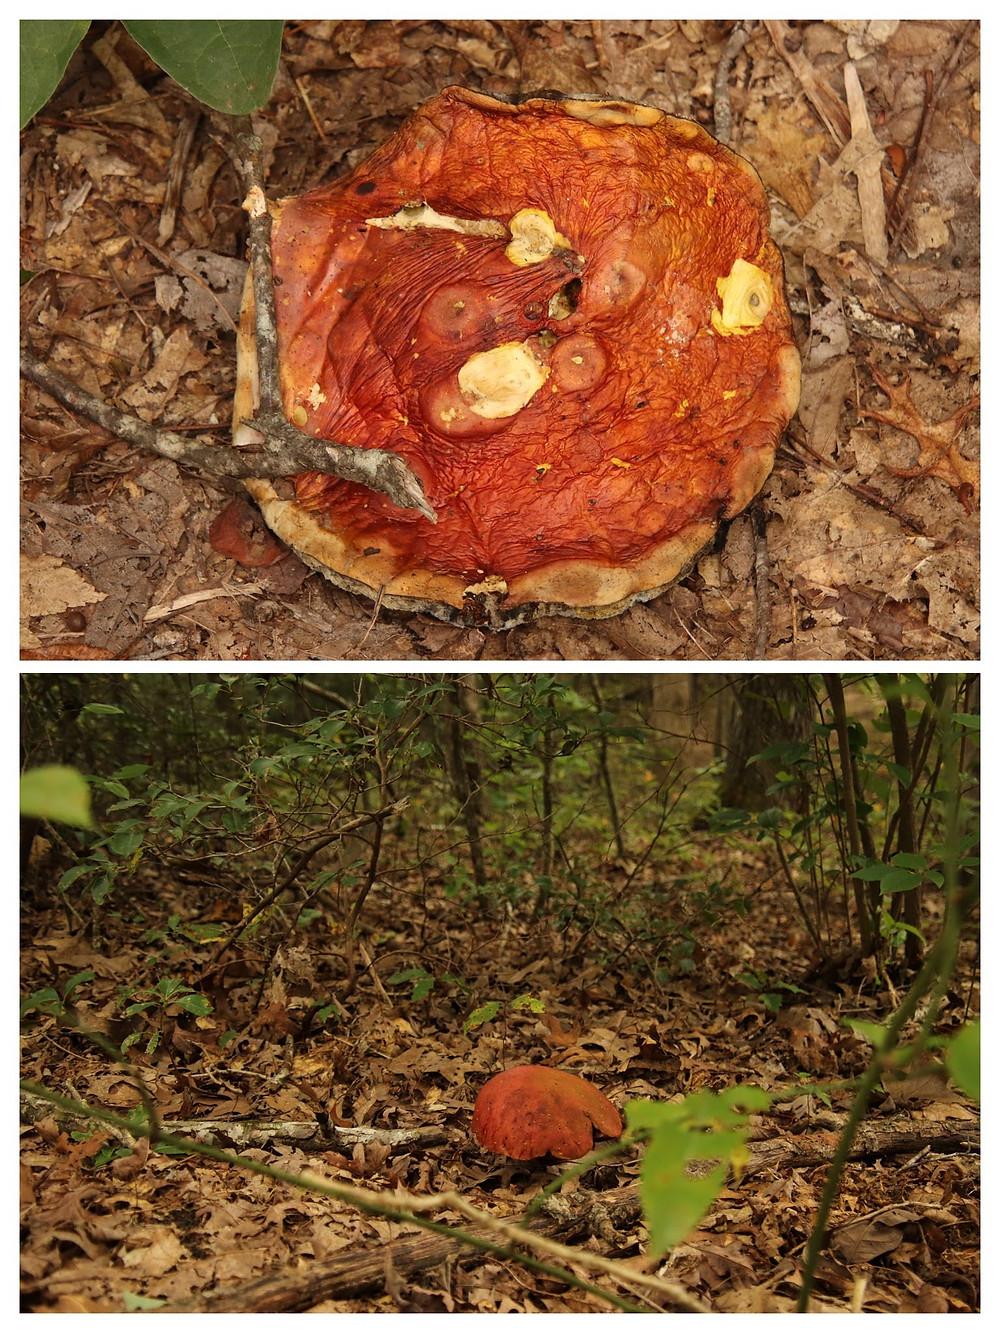 Big Rust Orange Mushrooms